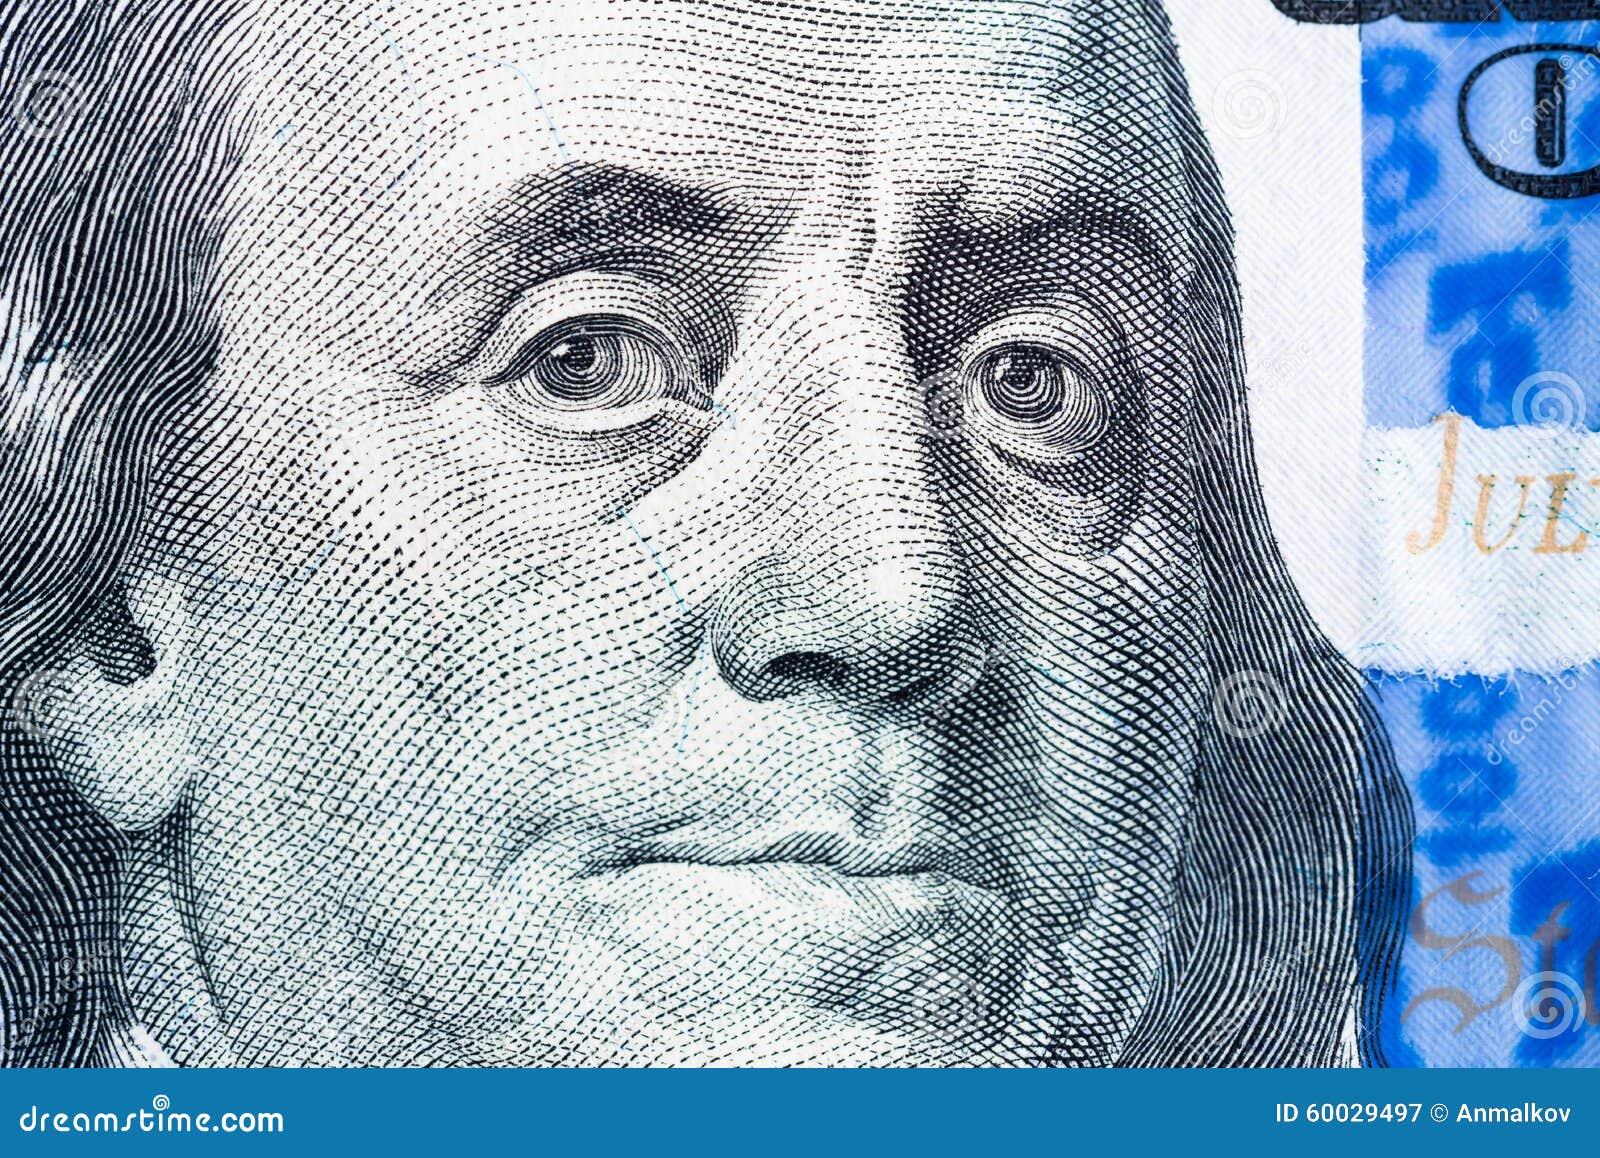 Benjamin Franklin Face Macro On United States Dollar Bill